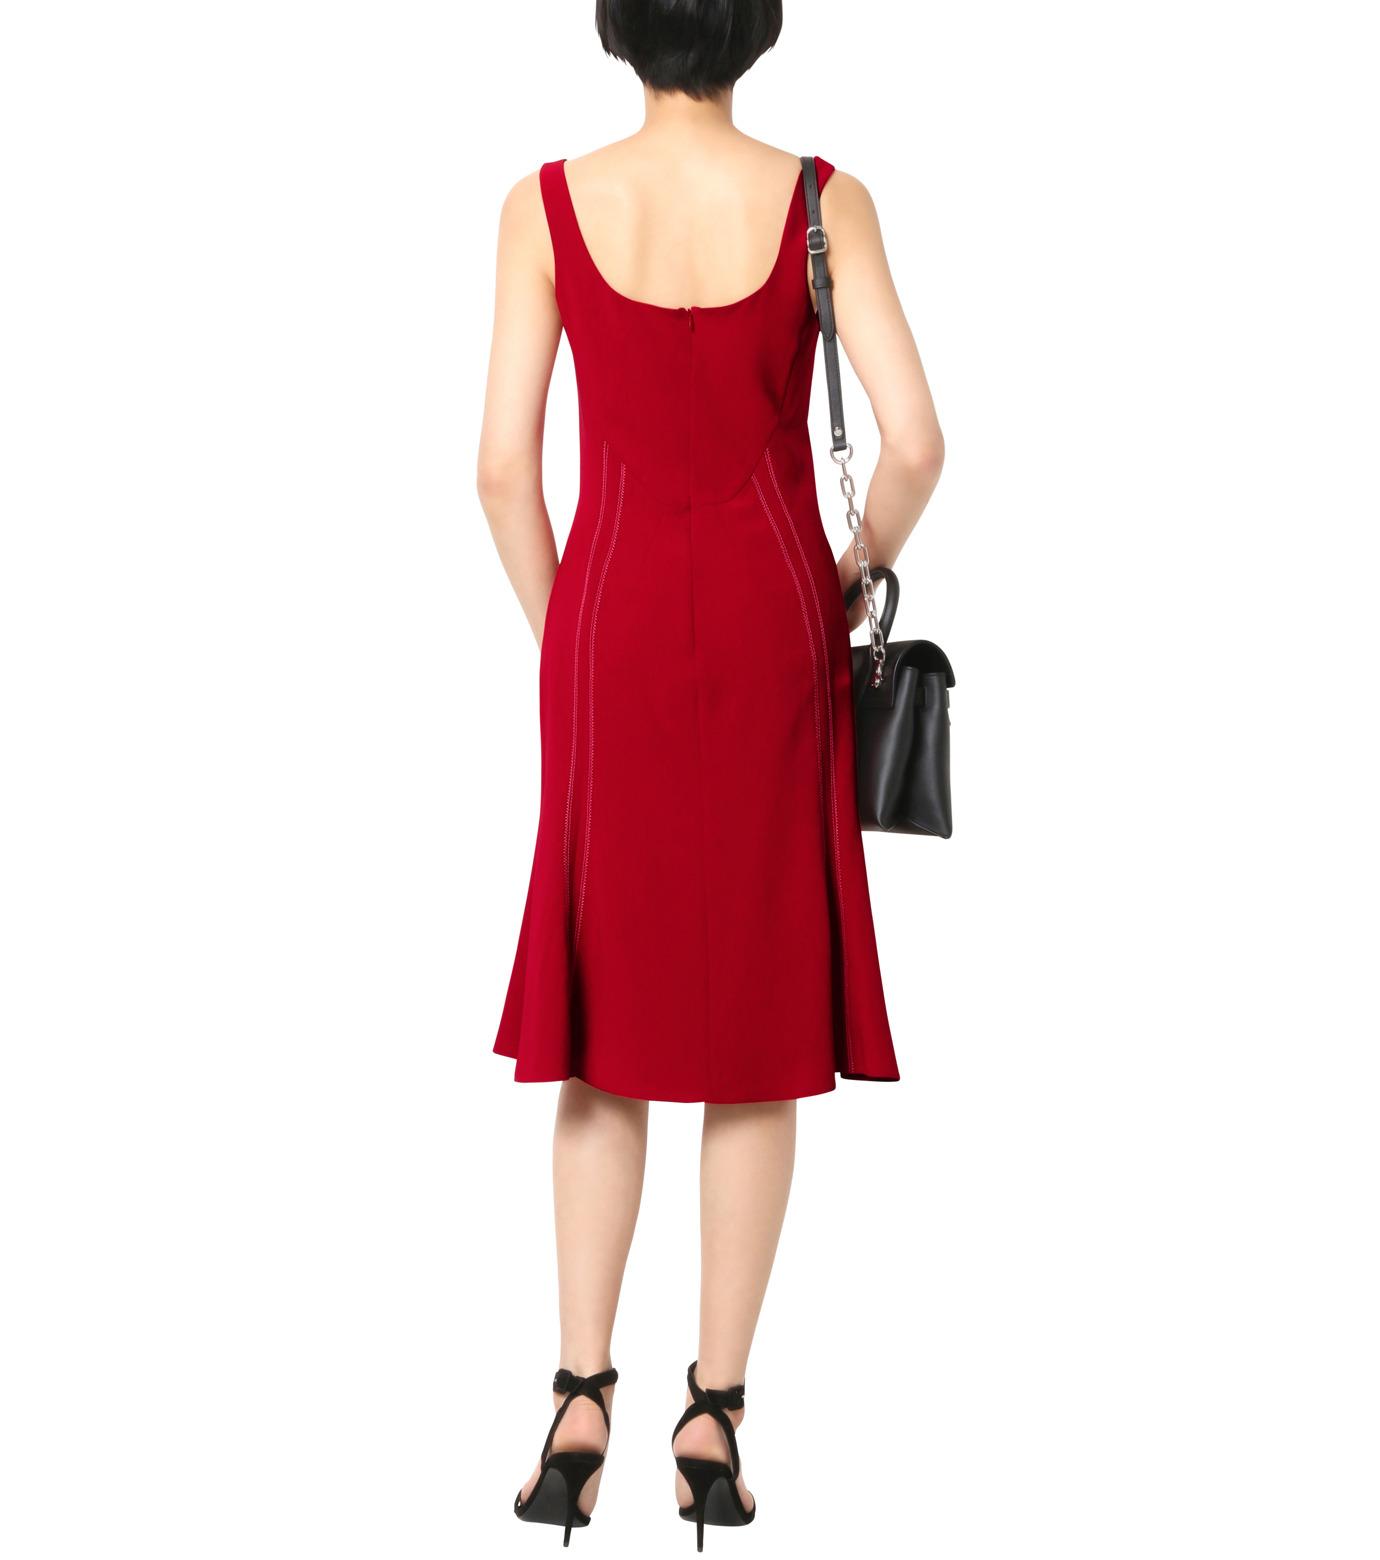 Altuzarra(アルトゥザラ)のStitched Detail Dress-RED(ワンピース/one piece)-316-317-89-62 拡大詳細画像2